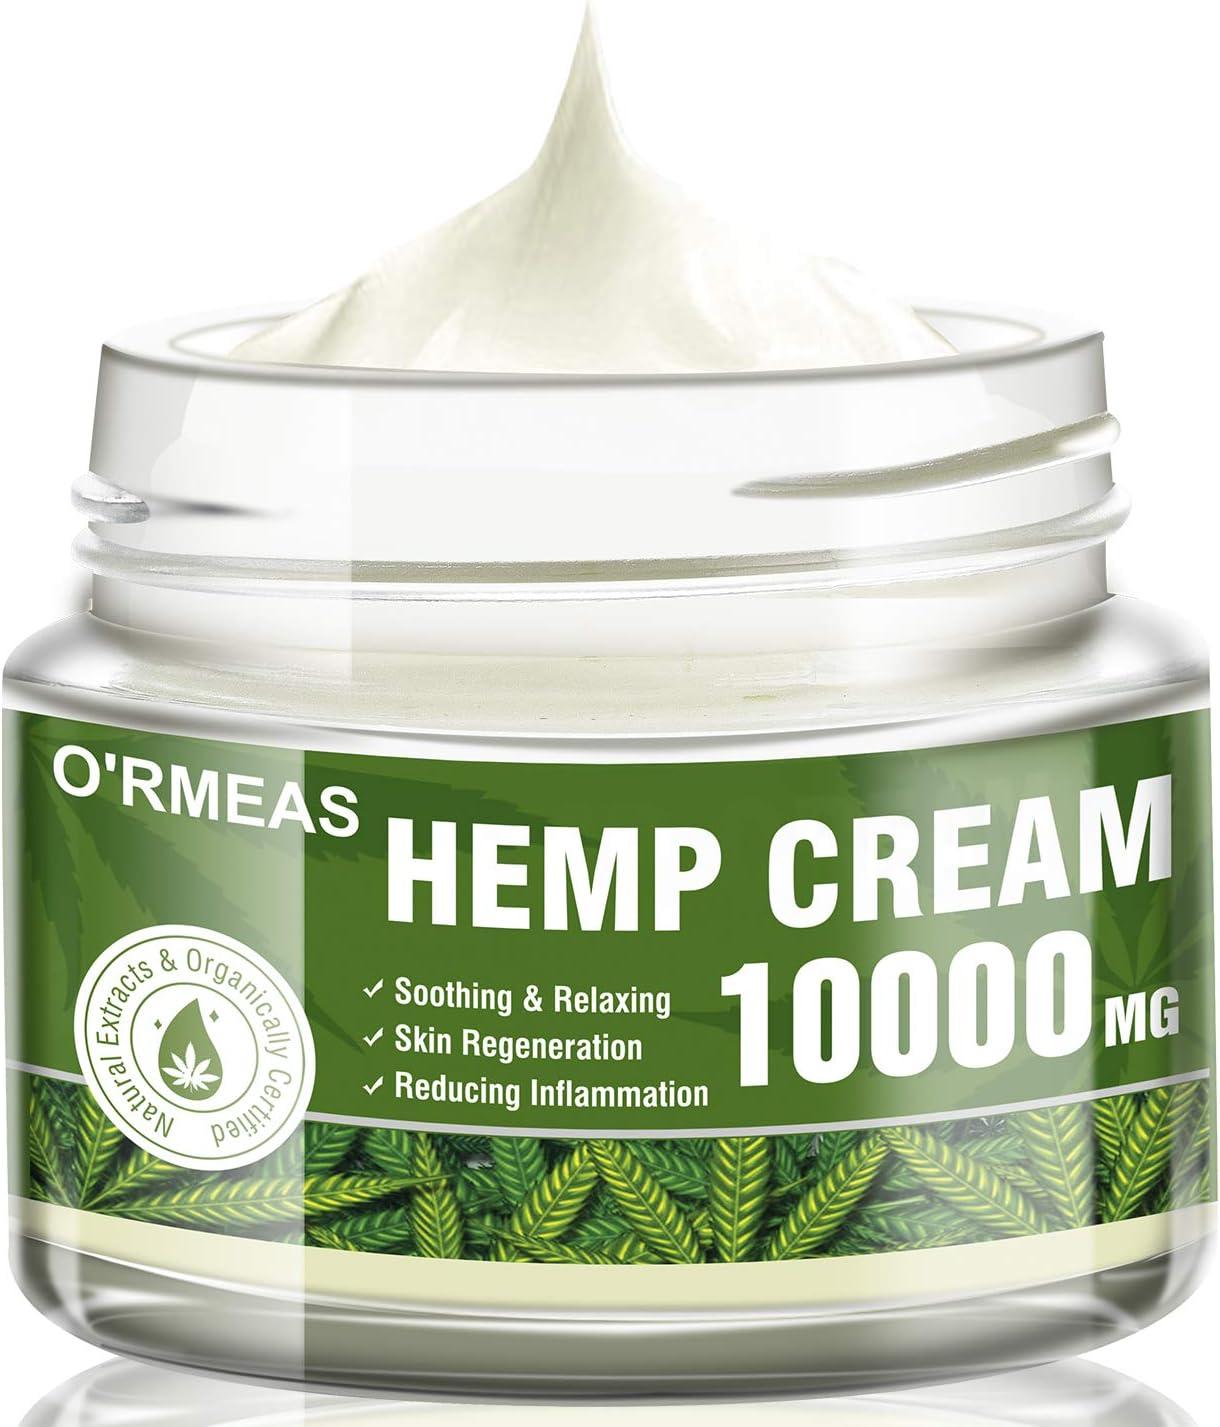 Hemp Cream for Pain Relief - Hemp Oil Extract & Hemp Cream Complex 10000 MG/ 4 oz- Emu Oil,Aloe Vera,Menthol,Rosemary oil ,Good for Muscle, Back, Knee Pain